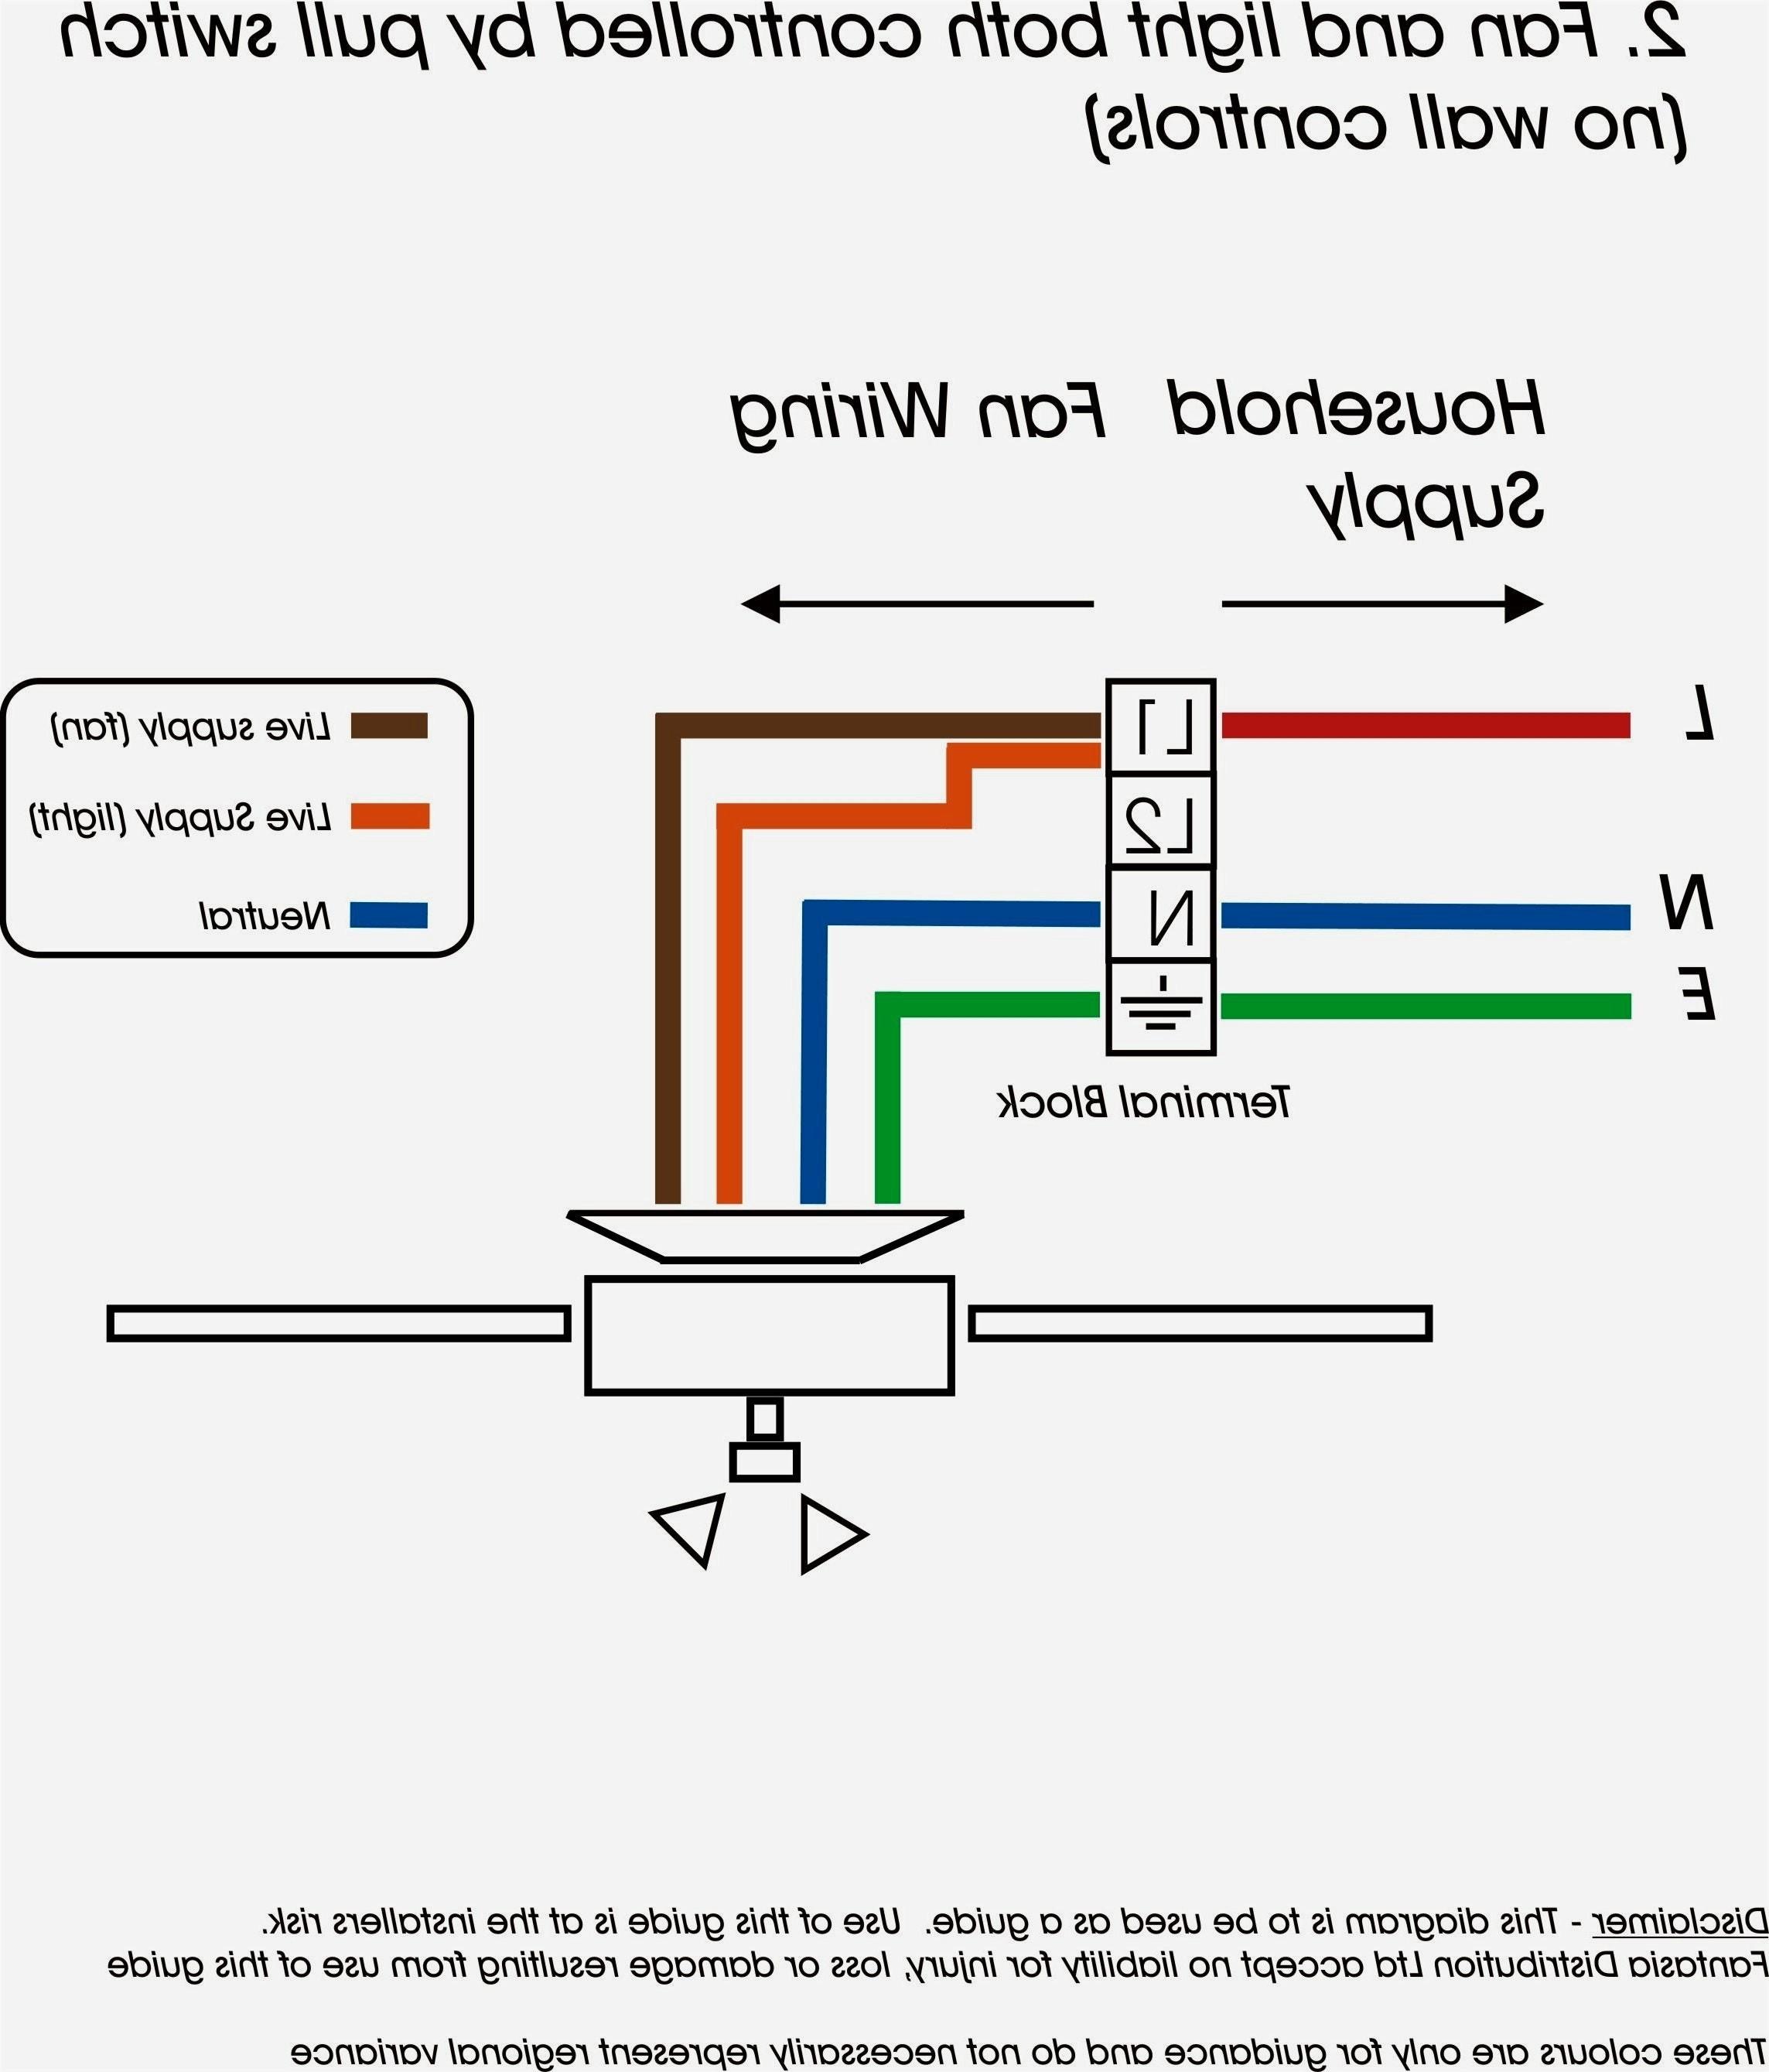 Wiring Diagram For Way Switch Elegant Wiring Diagram Image - Ceiling fan 3 way switch wiring diagram